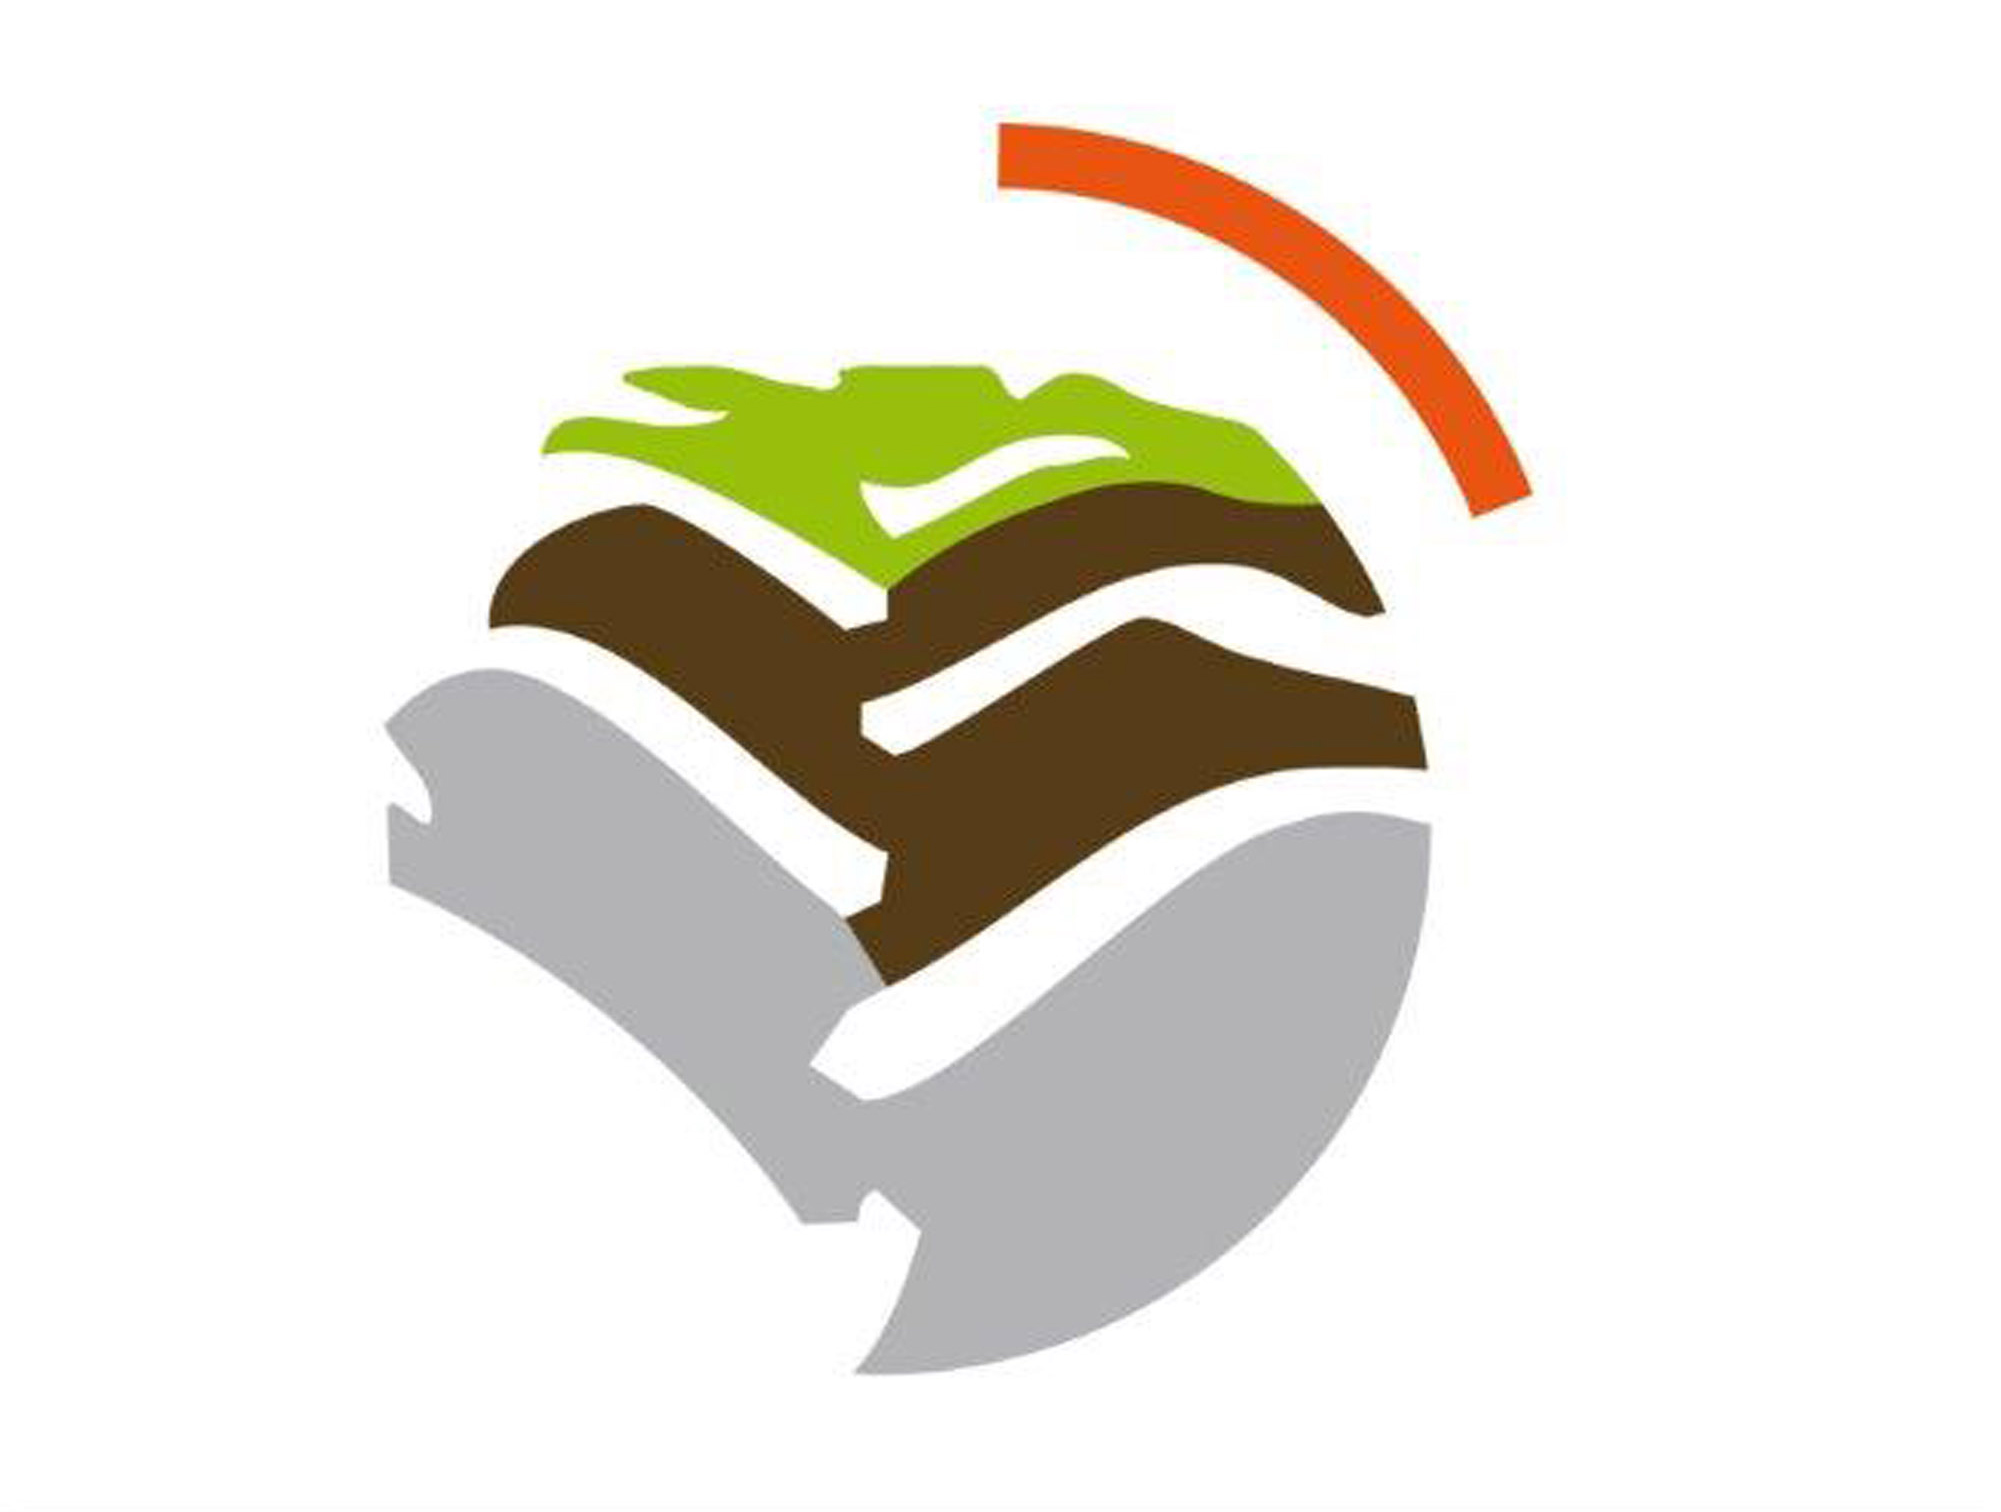 LBT-Logo |copyright: Bundesverband LandBauTechnik